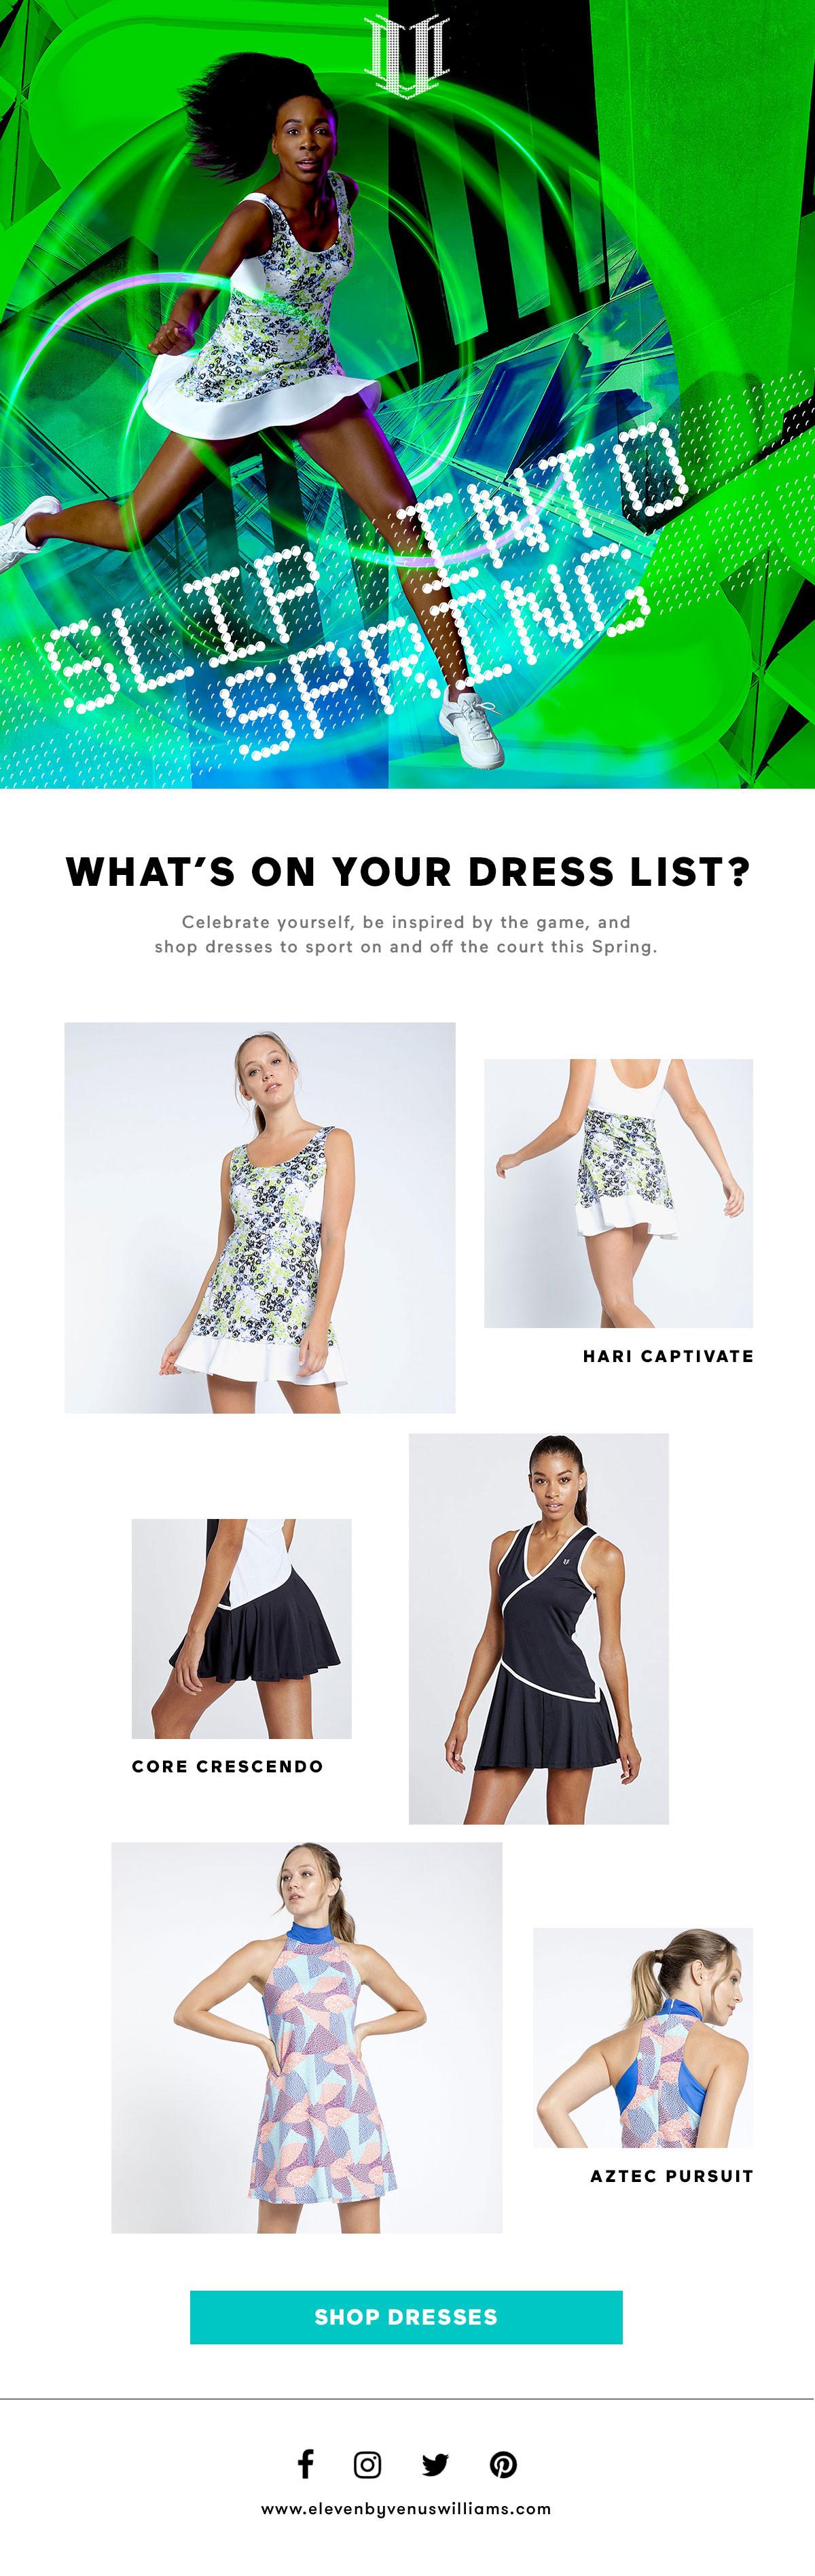 EleVen_Tennis_Dress_Email_Blast_V6 copy.